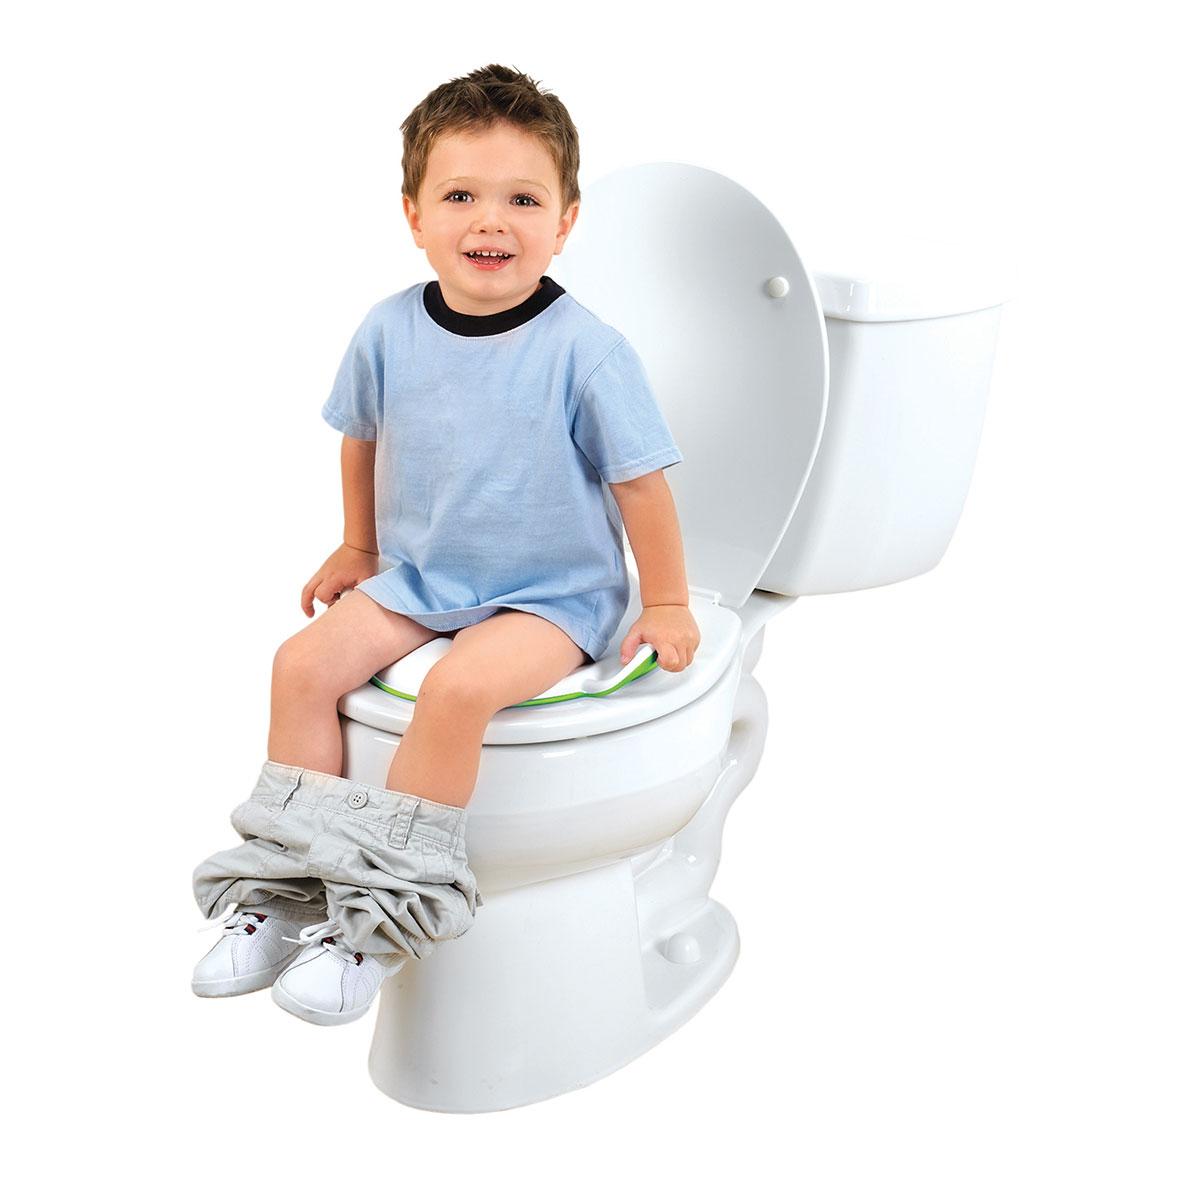 14f5af127 Munchkin Sturdy™ Potty Seat